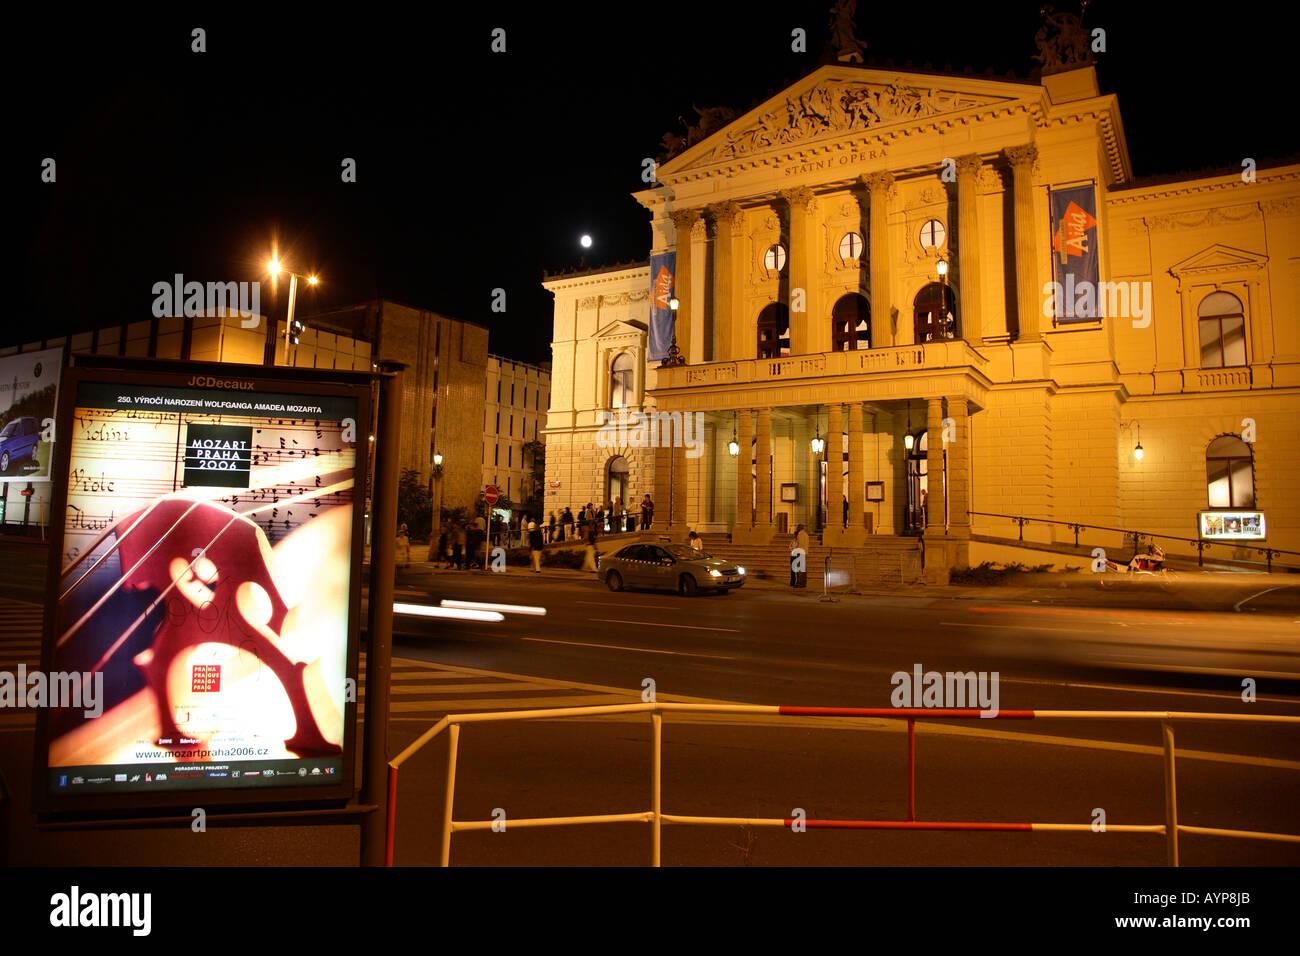 Prague state opera exterior horizontal prague state opera for House music 2006